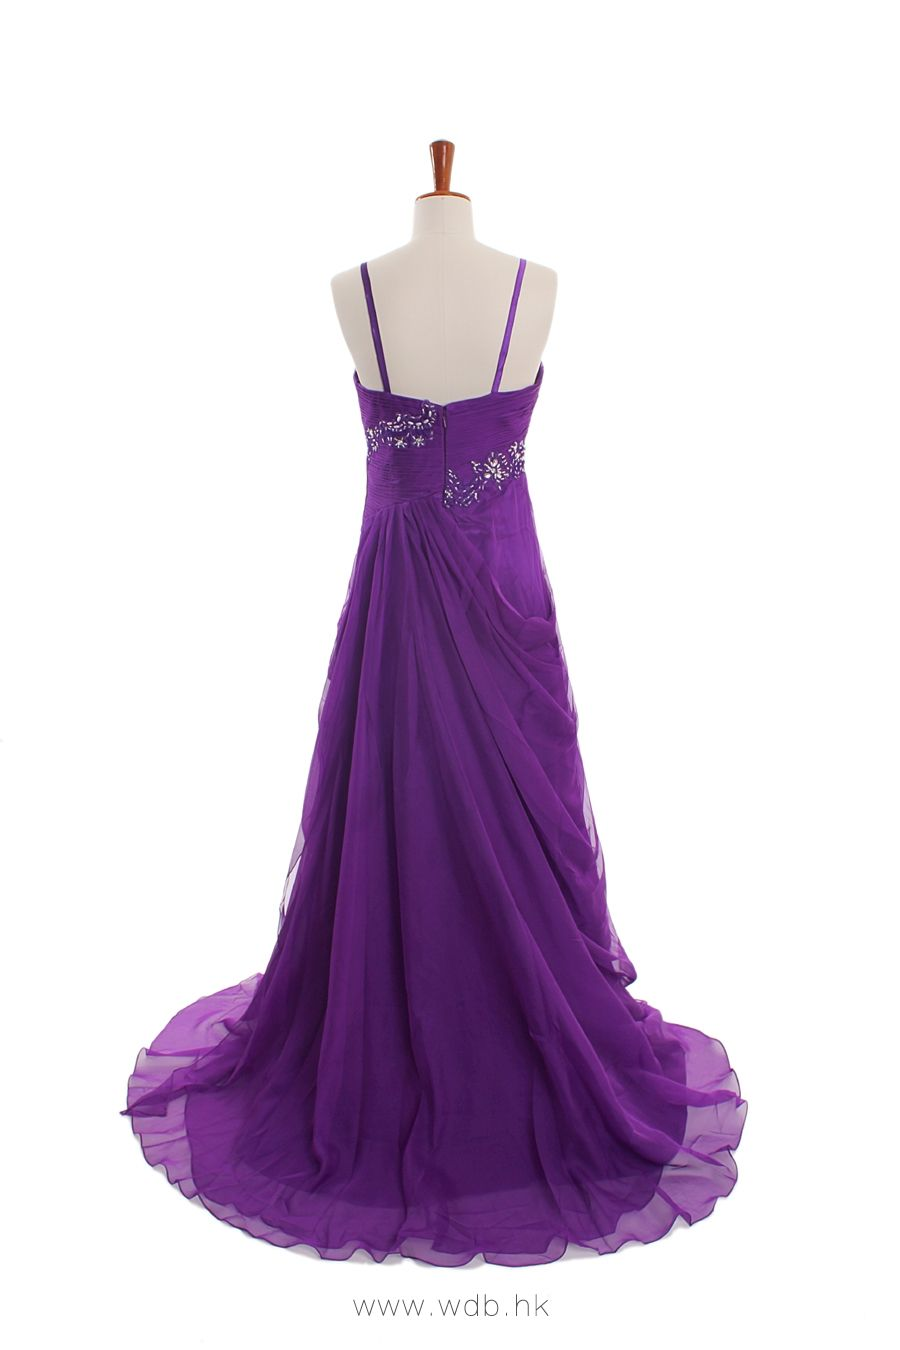 2012 Fall Spaghetti Straps Silk Chiffon Bridesmaid Dress $140 ...